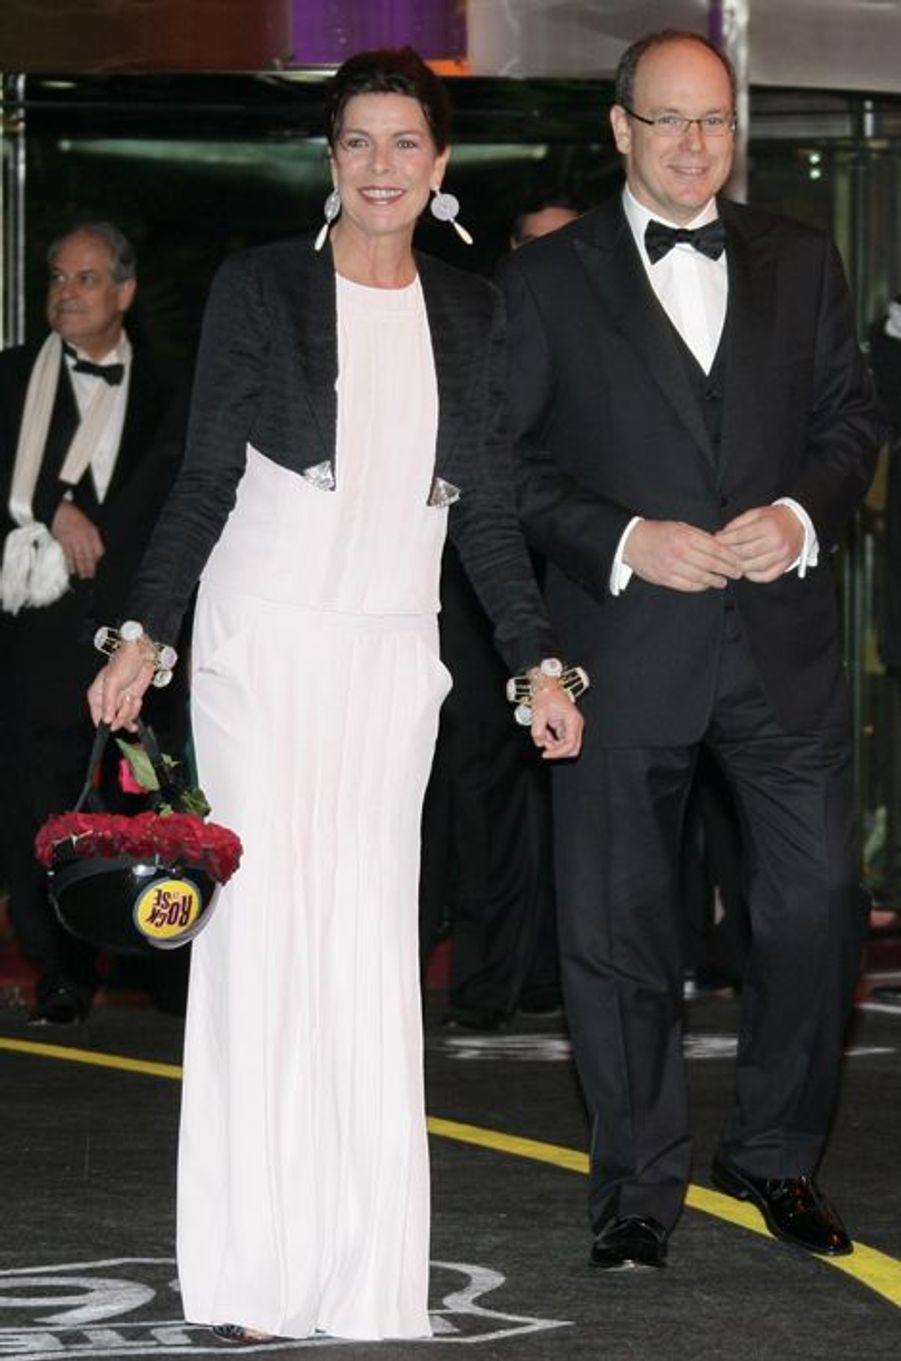 La princesse Caroline de Monaco au bal de la Rose 2009, avec le prince Albert II